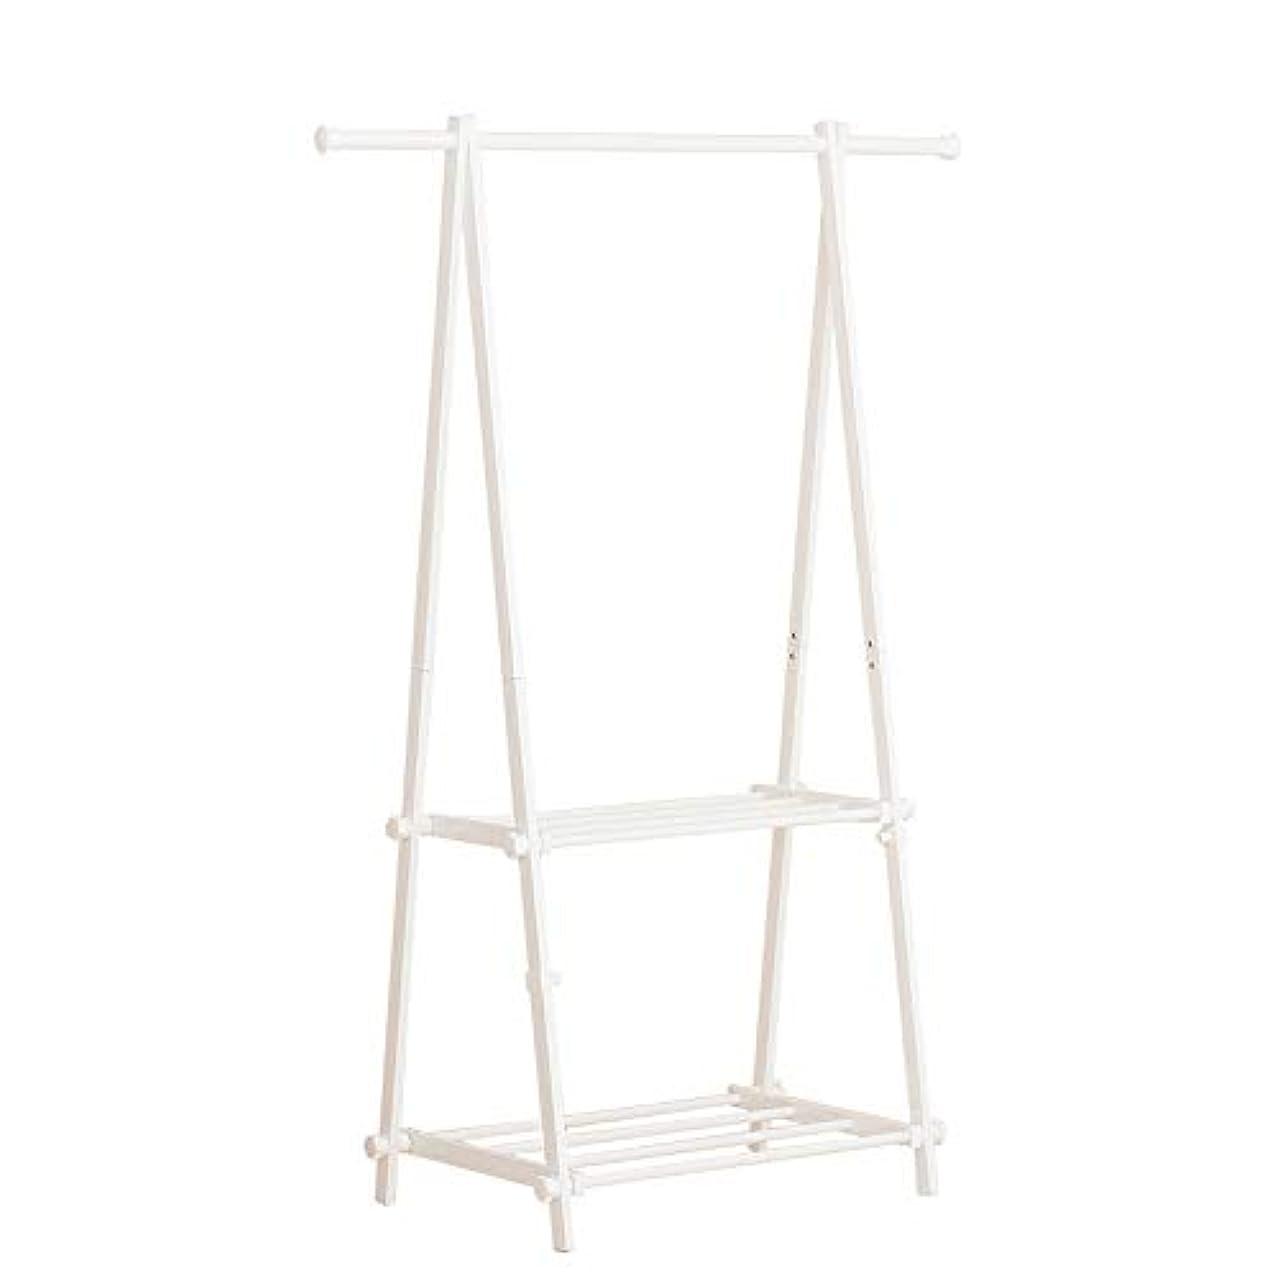 NOBLJX 2-Tier Garment Rack, Clothes Coat Rails Shoe Rack, Metal Multi-Purpose Storage Organization Shelves for Home Office Hallway Bedroom